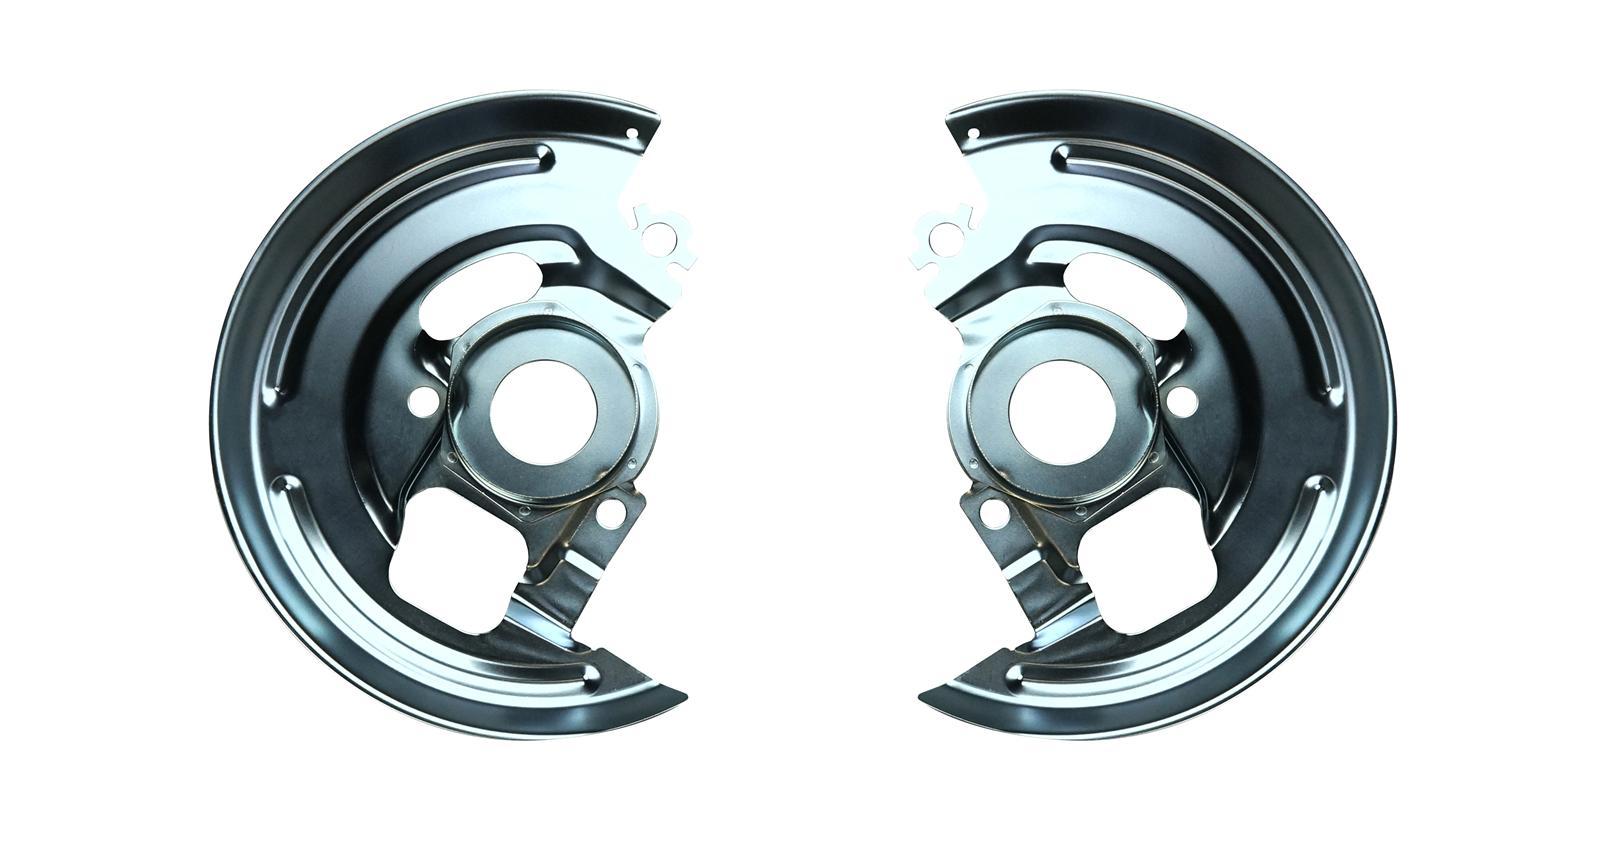 Single Pist Caliper Disc Brake Spindle Bracket Backing Plates Dust Shields 64-74